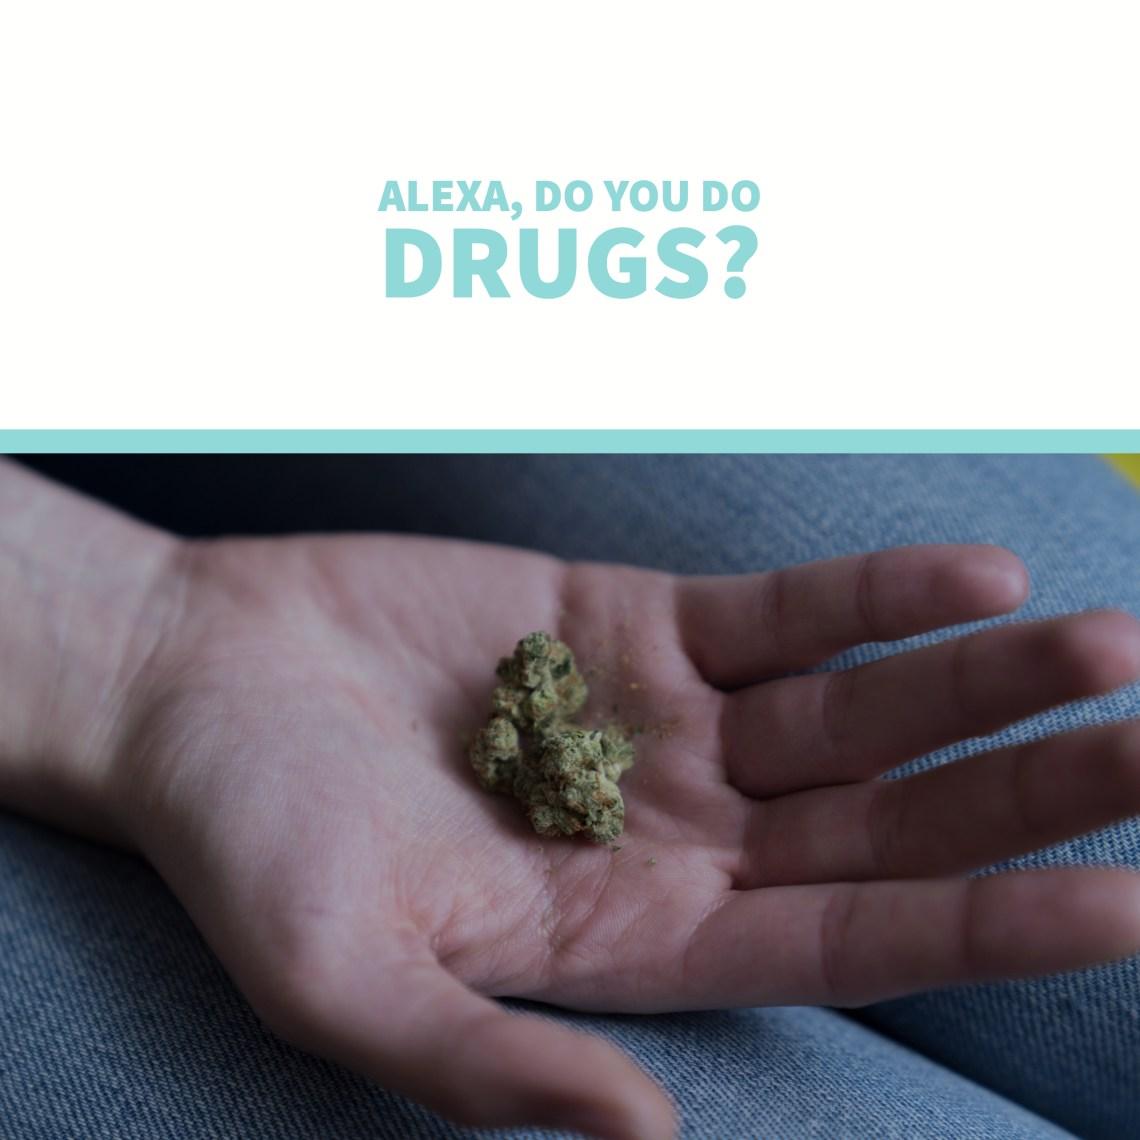 Alexa Drugs